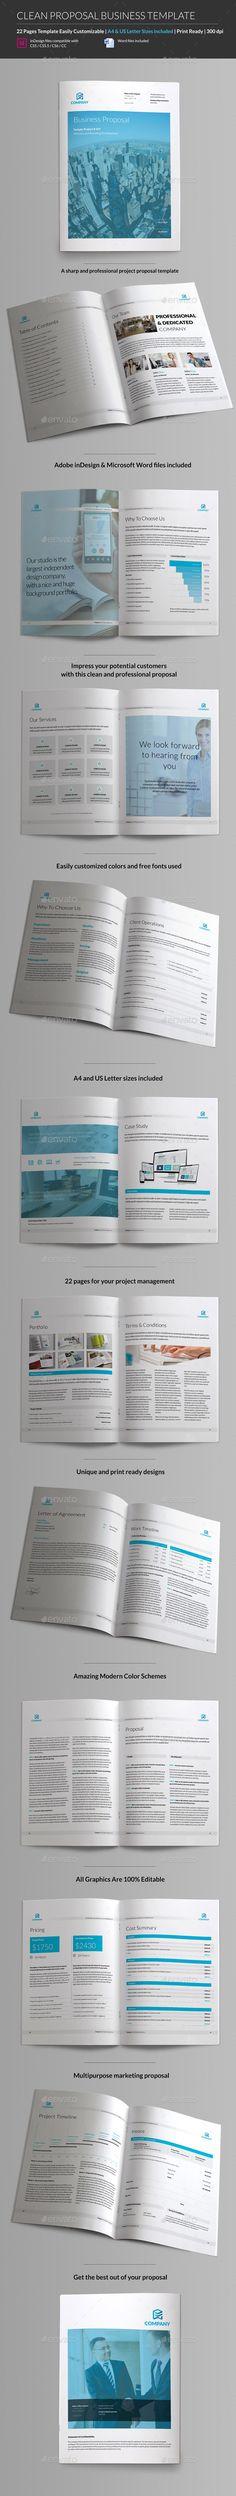 Business Proposal Template - A4 Portrait Business proposal - proposal templates